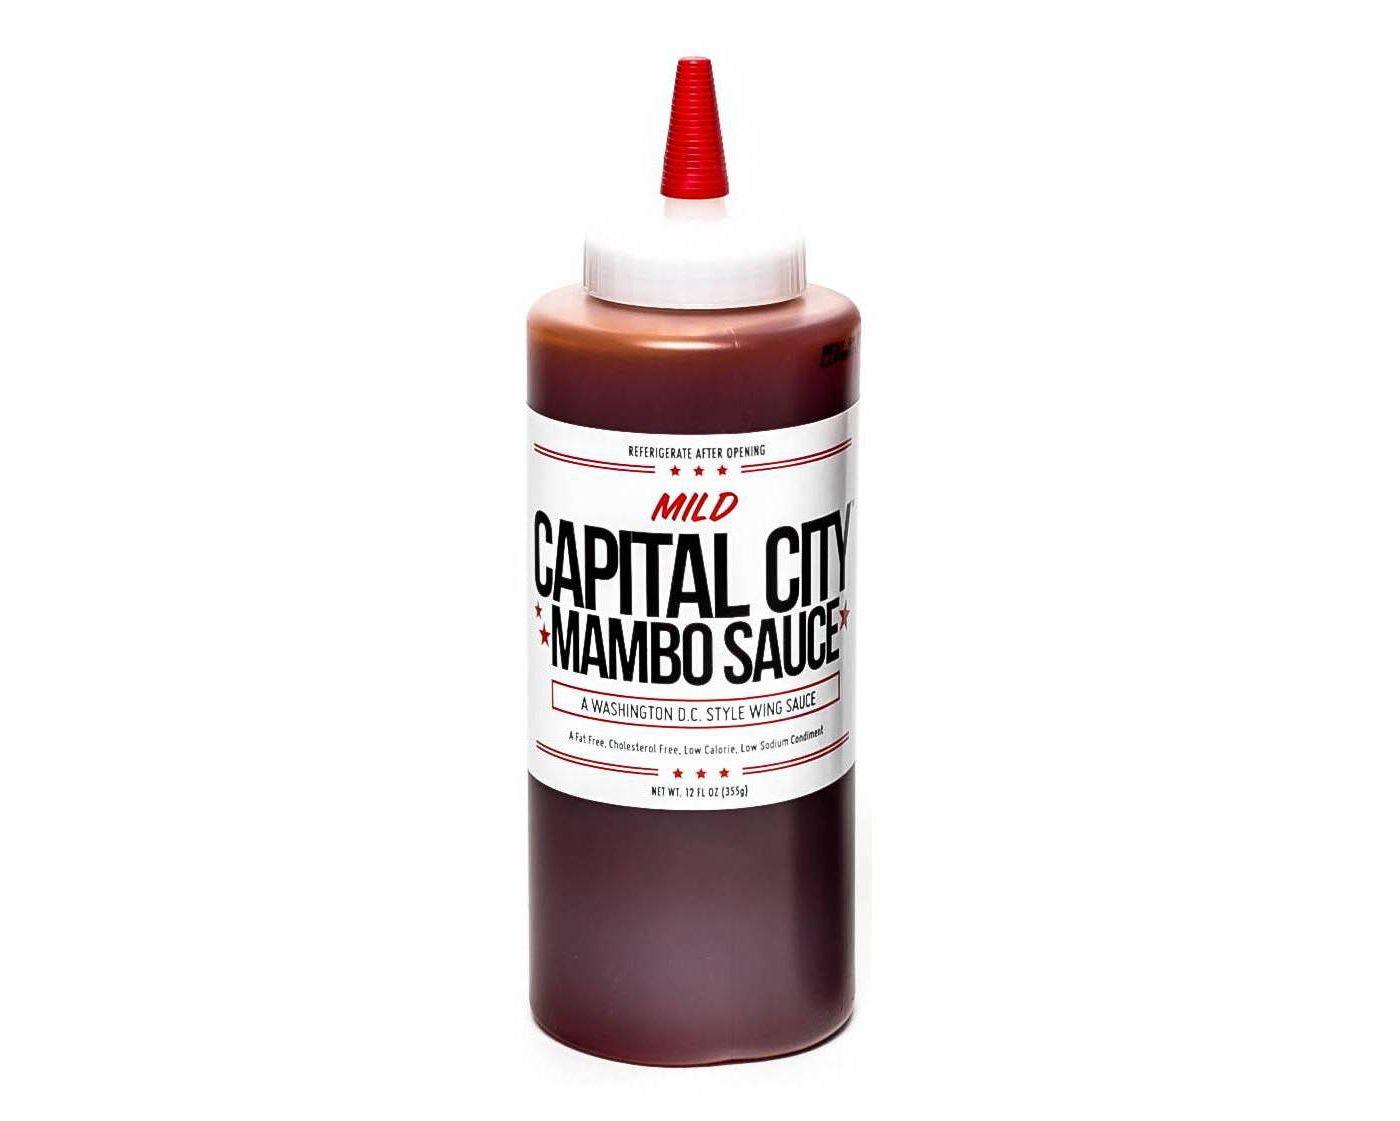 Capital City Mild Mambo Sauce - 12oz - image 1 of 3